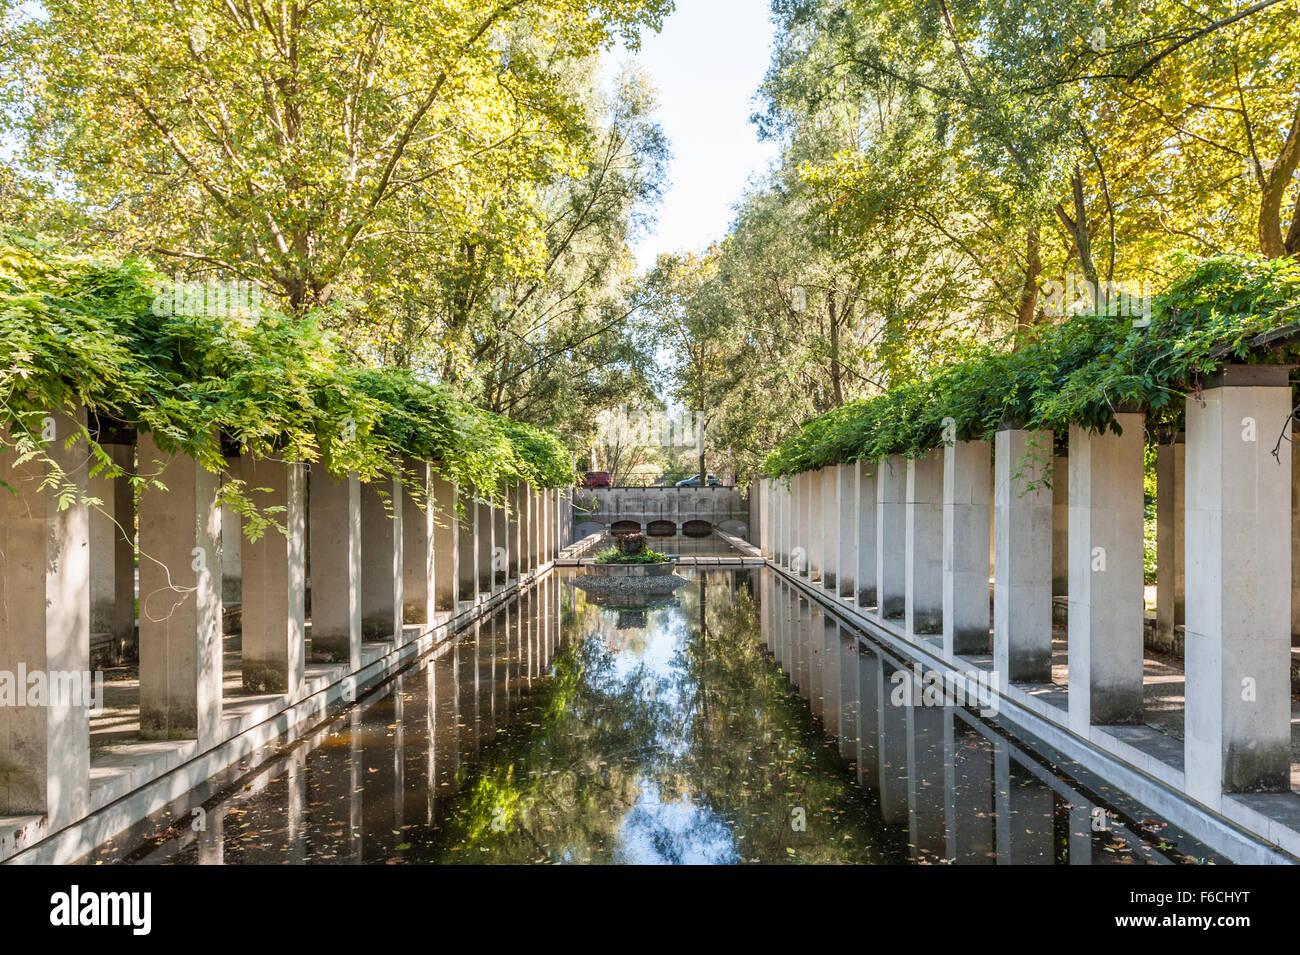 France, Paris, Parc de Bercy - Jardin de Yitzhak Rabin - Stock Image